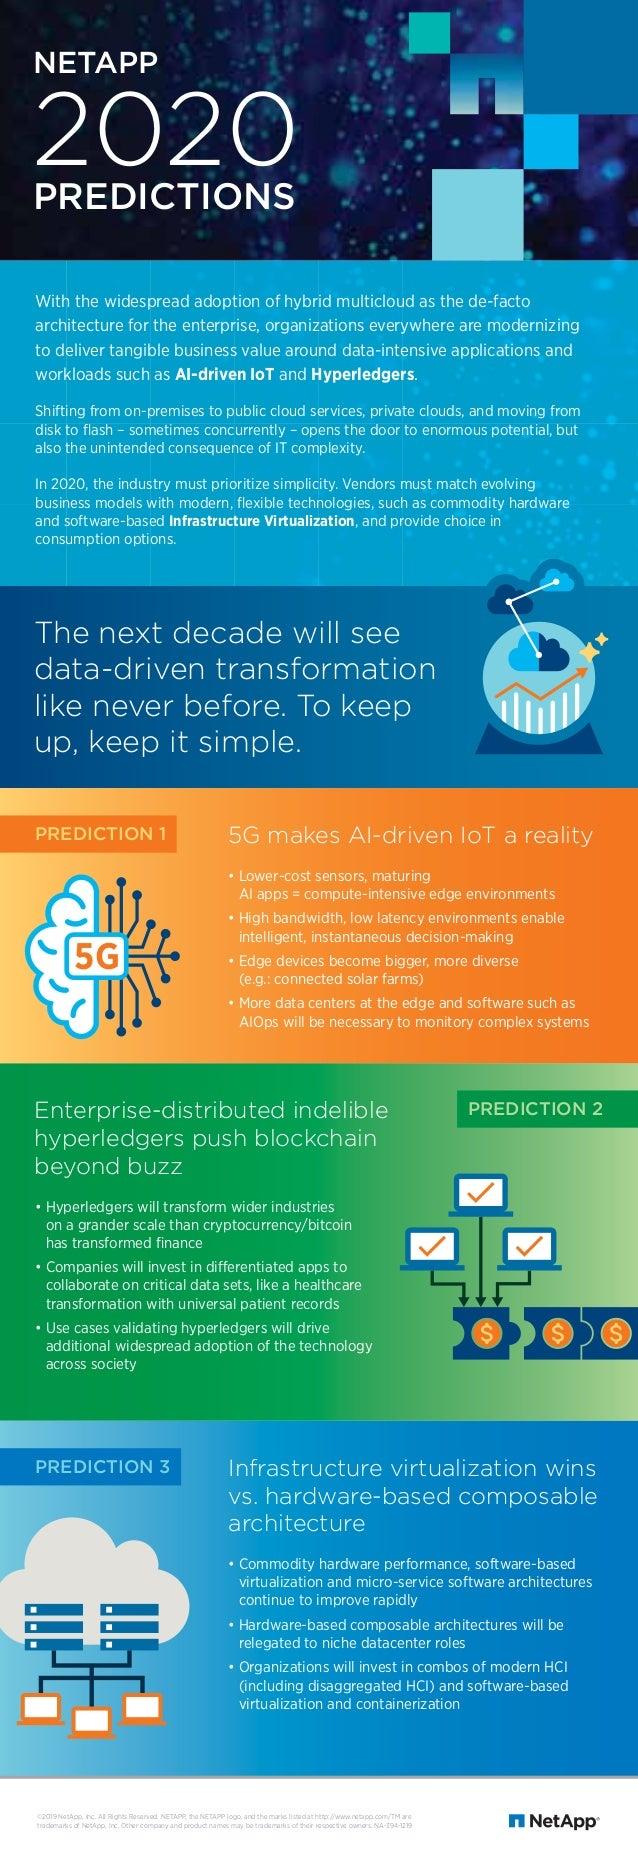 NetApp 2020 Predictions